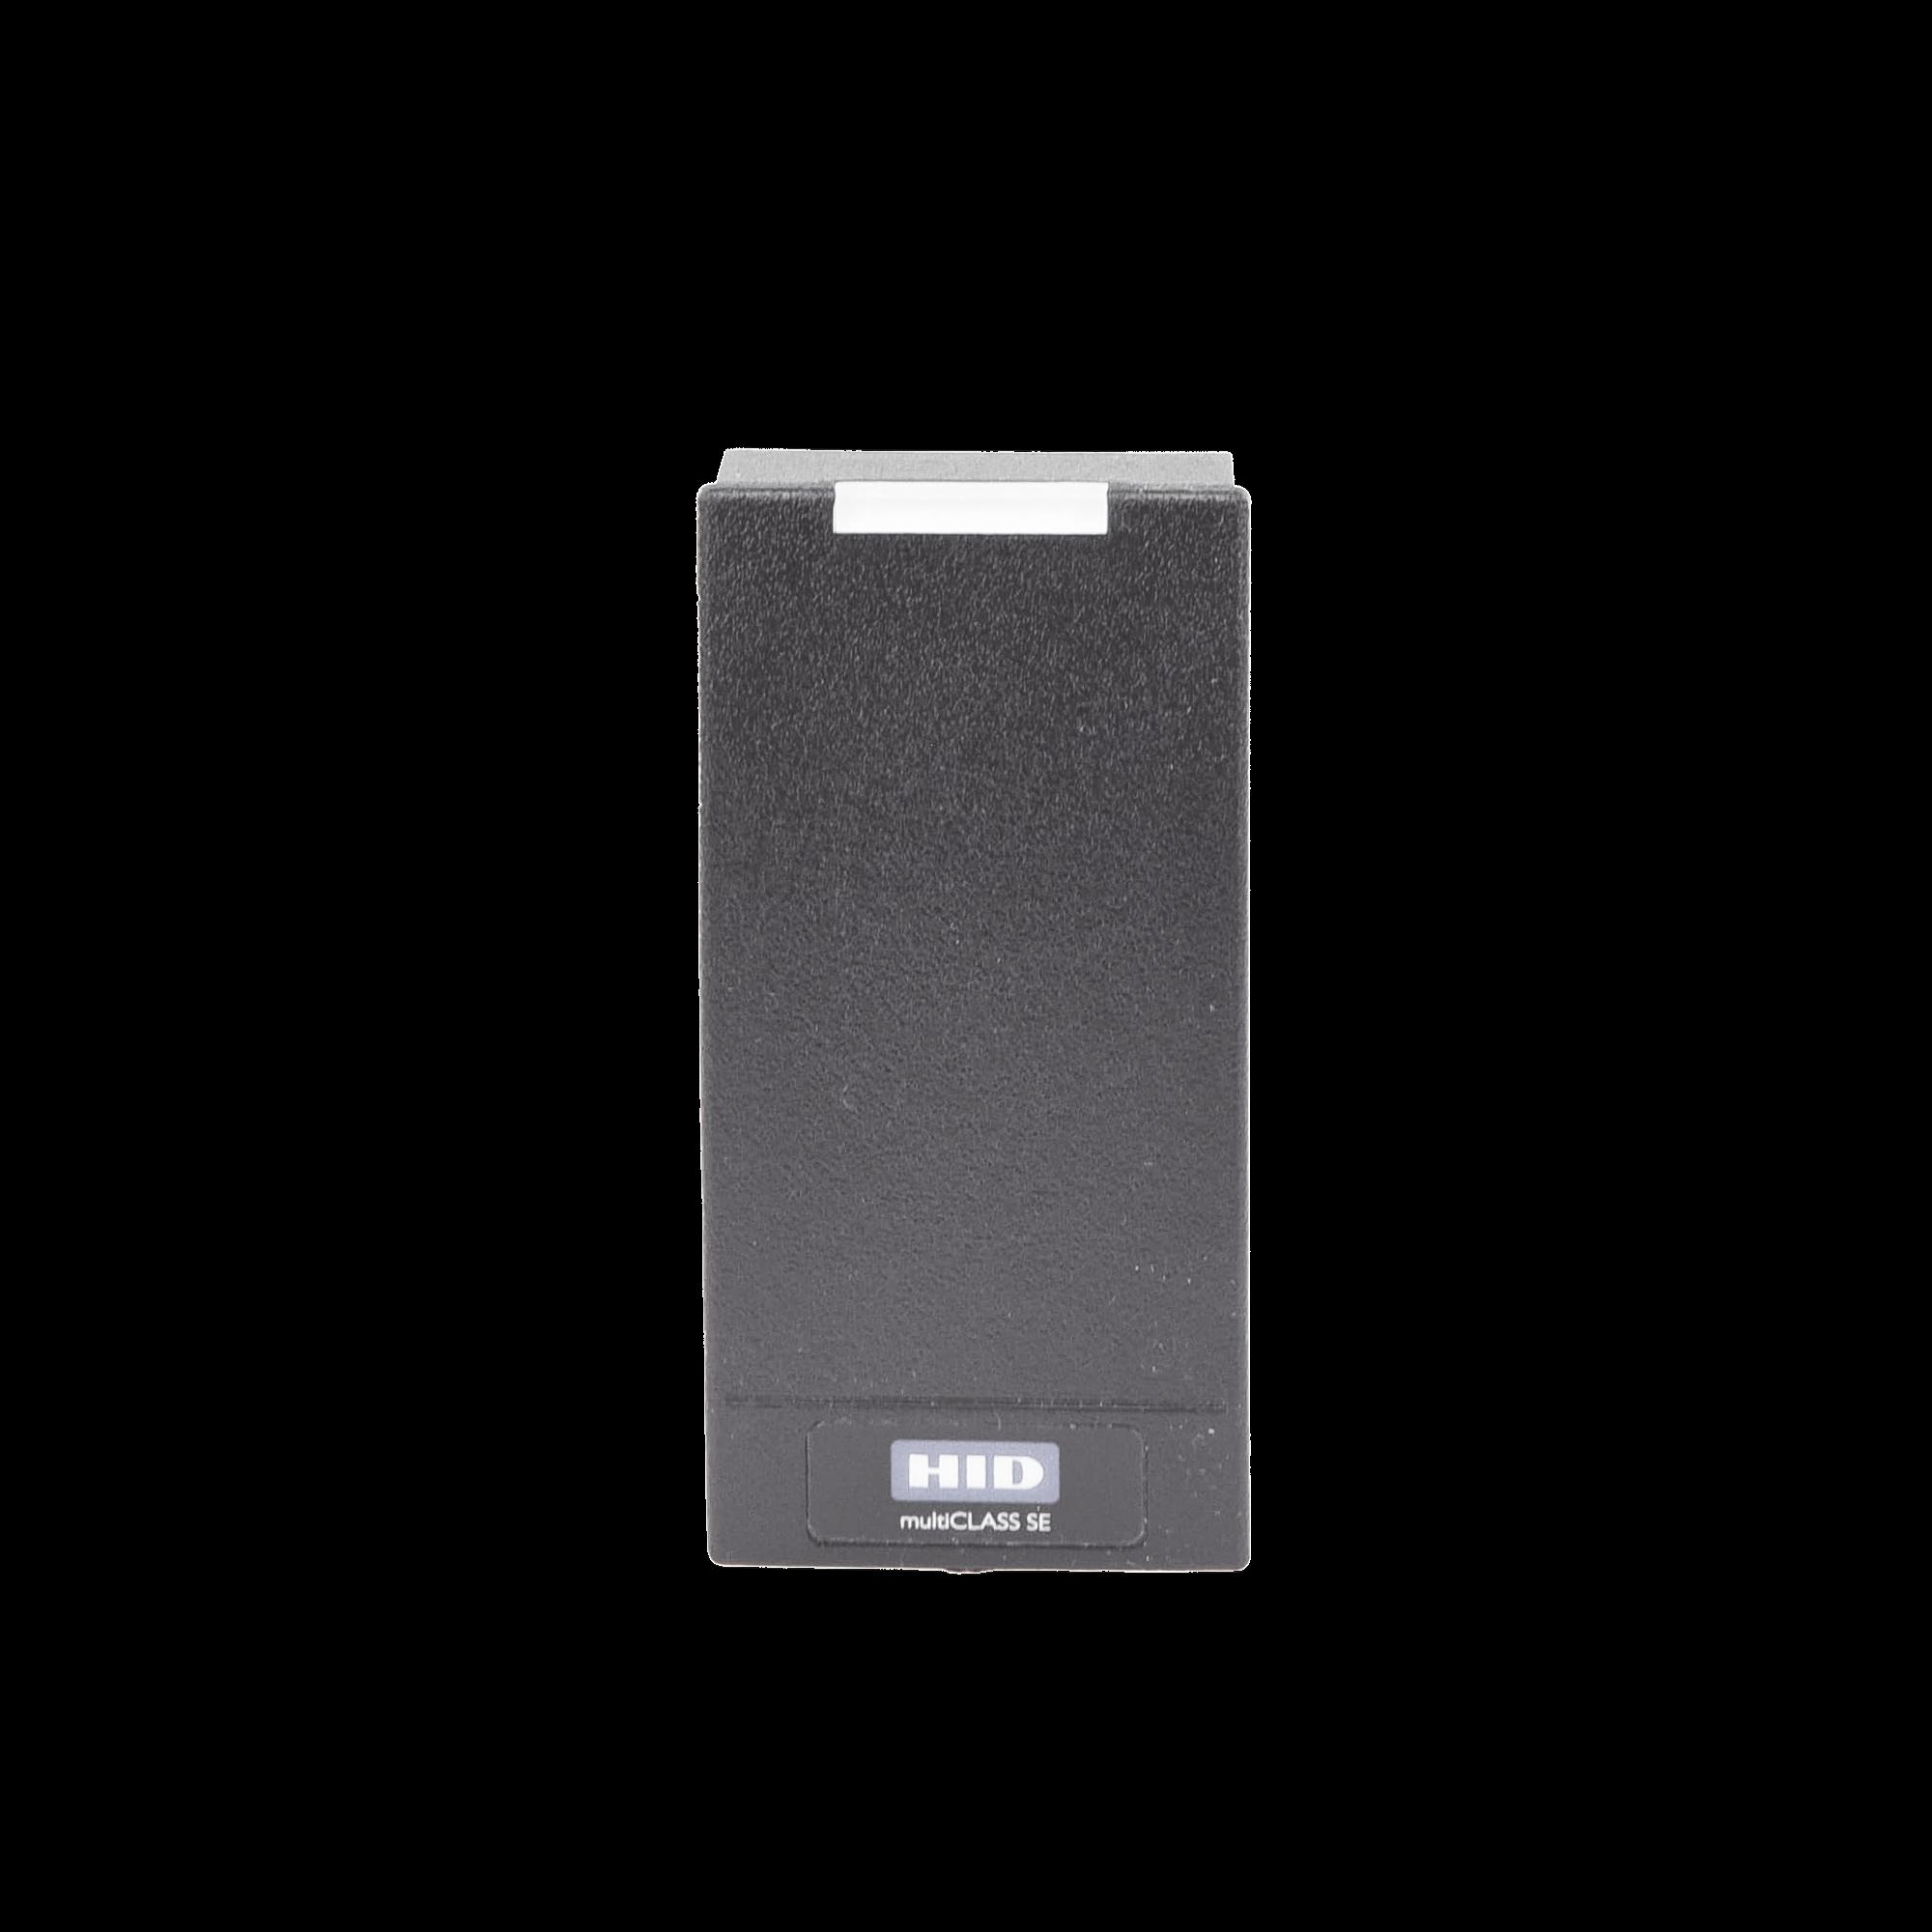 Lector HID R10 (900PMNTEKMA003) PROX HID, EM /iClass SEOS (no clonable) /iClass SE/ iClass SR/ iClass /Mifare Classic, DesFire, Bluetooth/ Garantía de por Vida